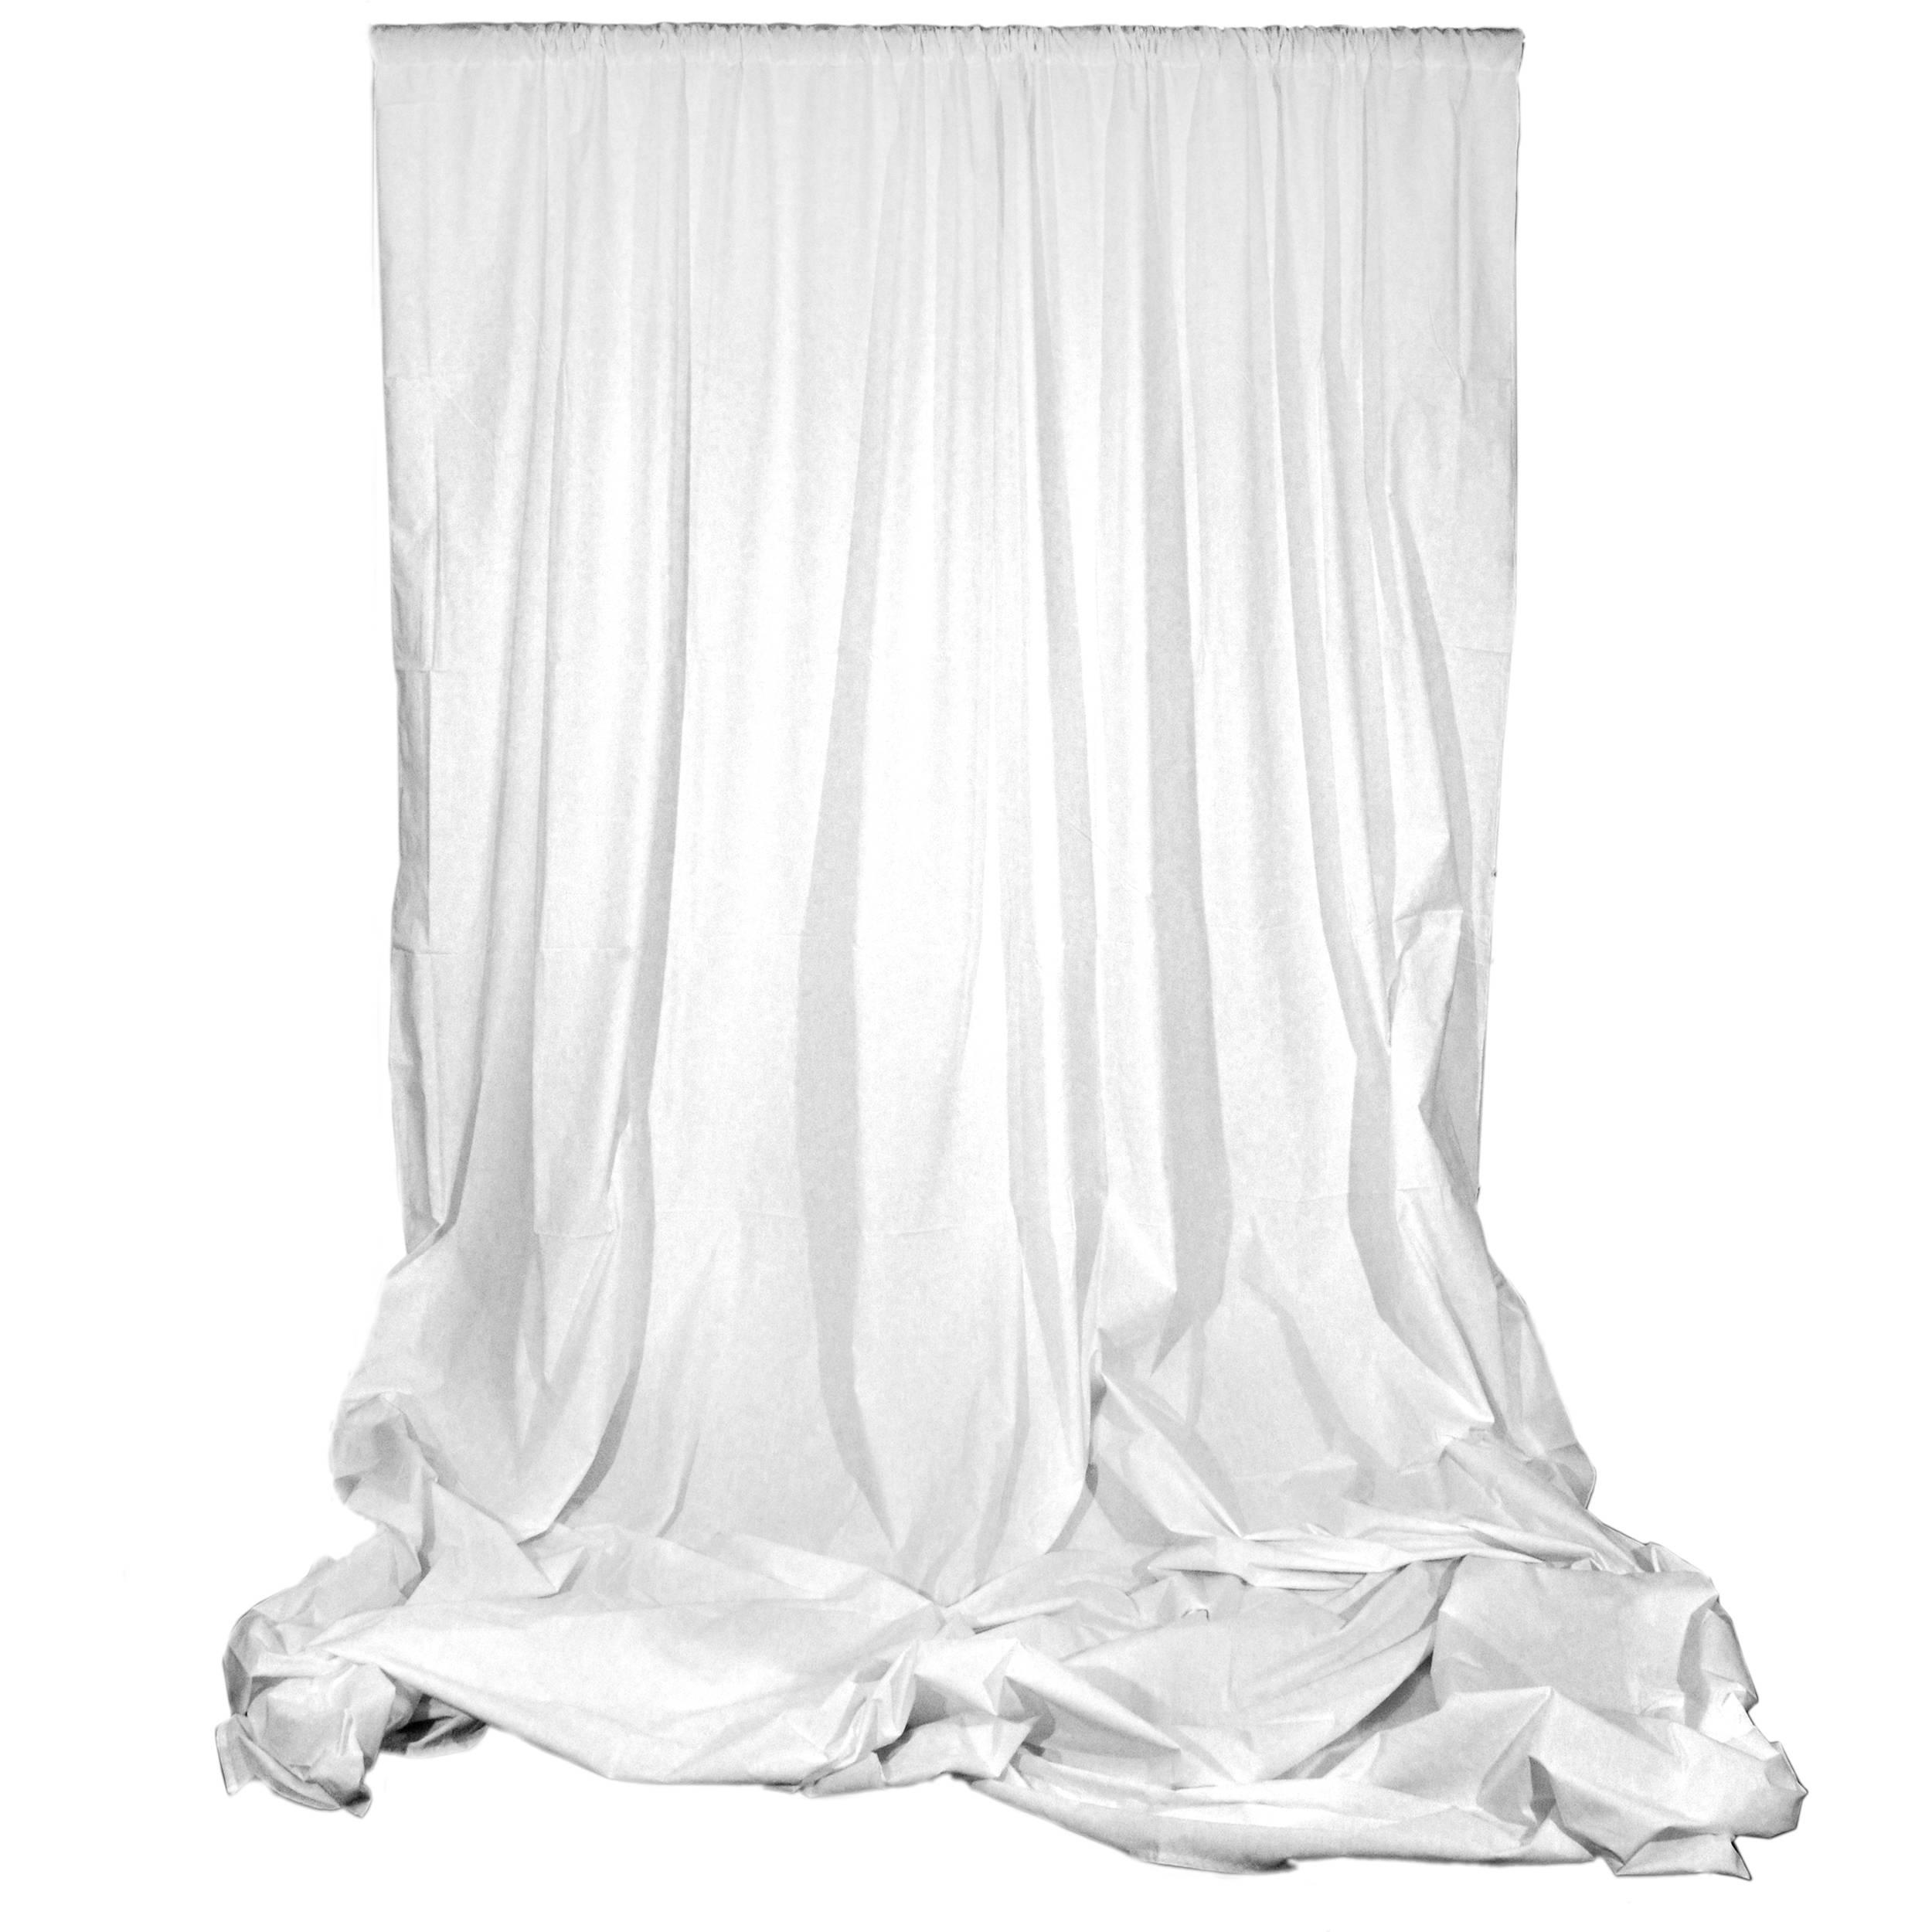 White Bed Sheet Backdrop